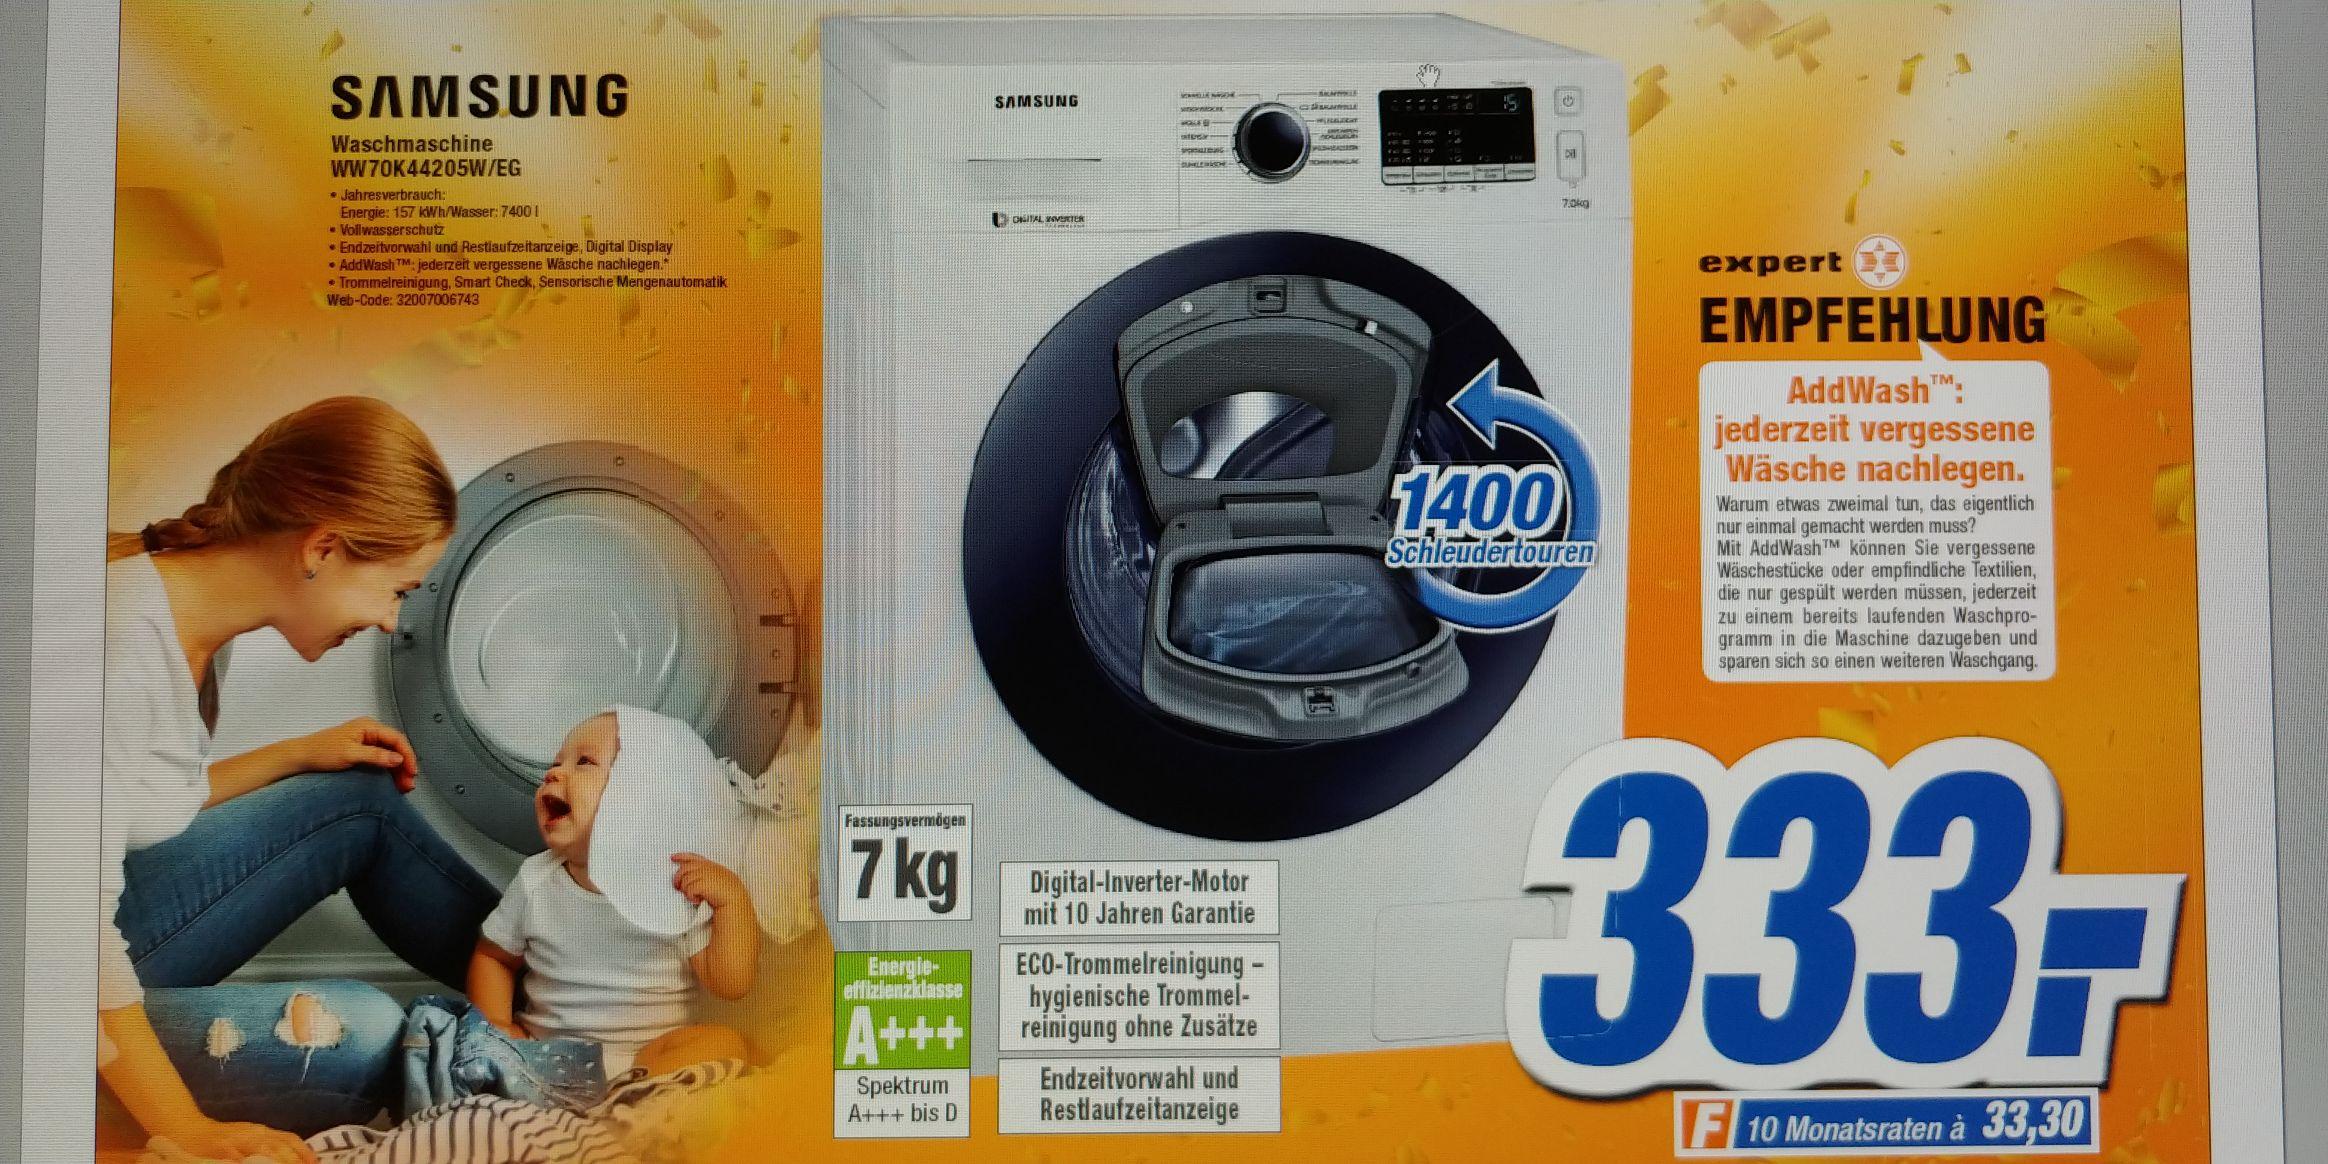 [Lokal] Expert Lingen - Samsung WW70K44205W/EG Waschmaschine 7 kg / 1400 U/min / Addwash / A+++